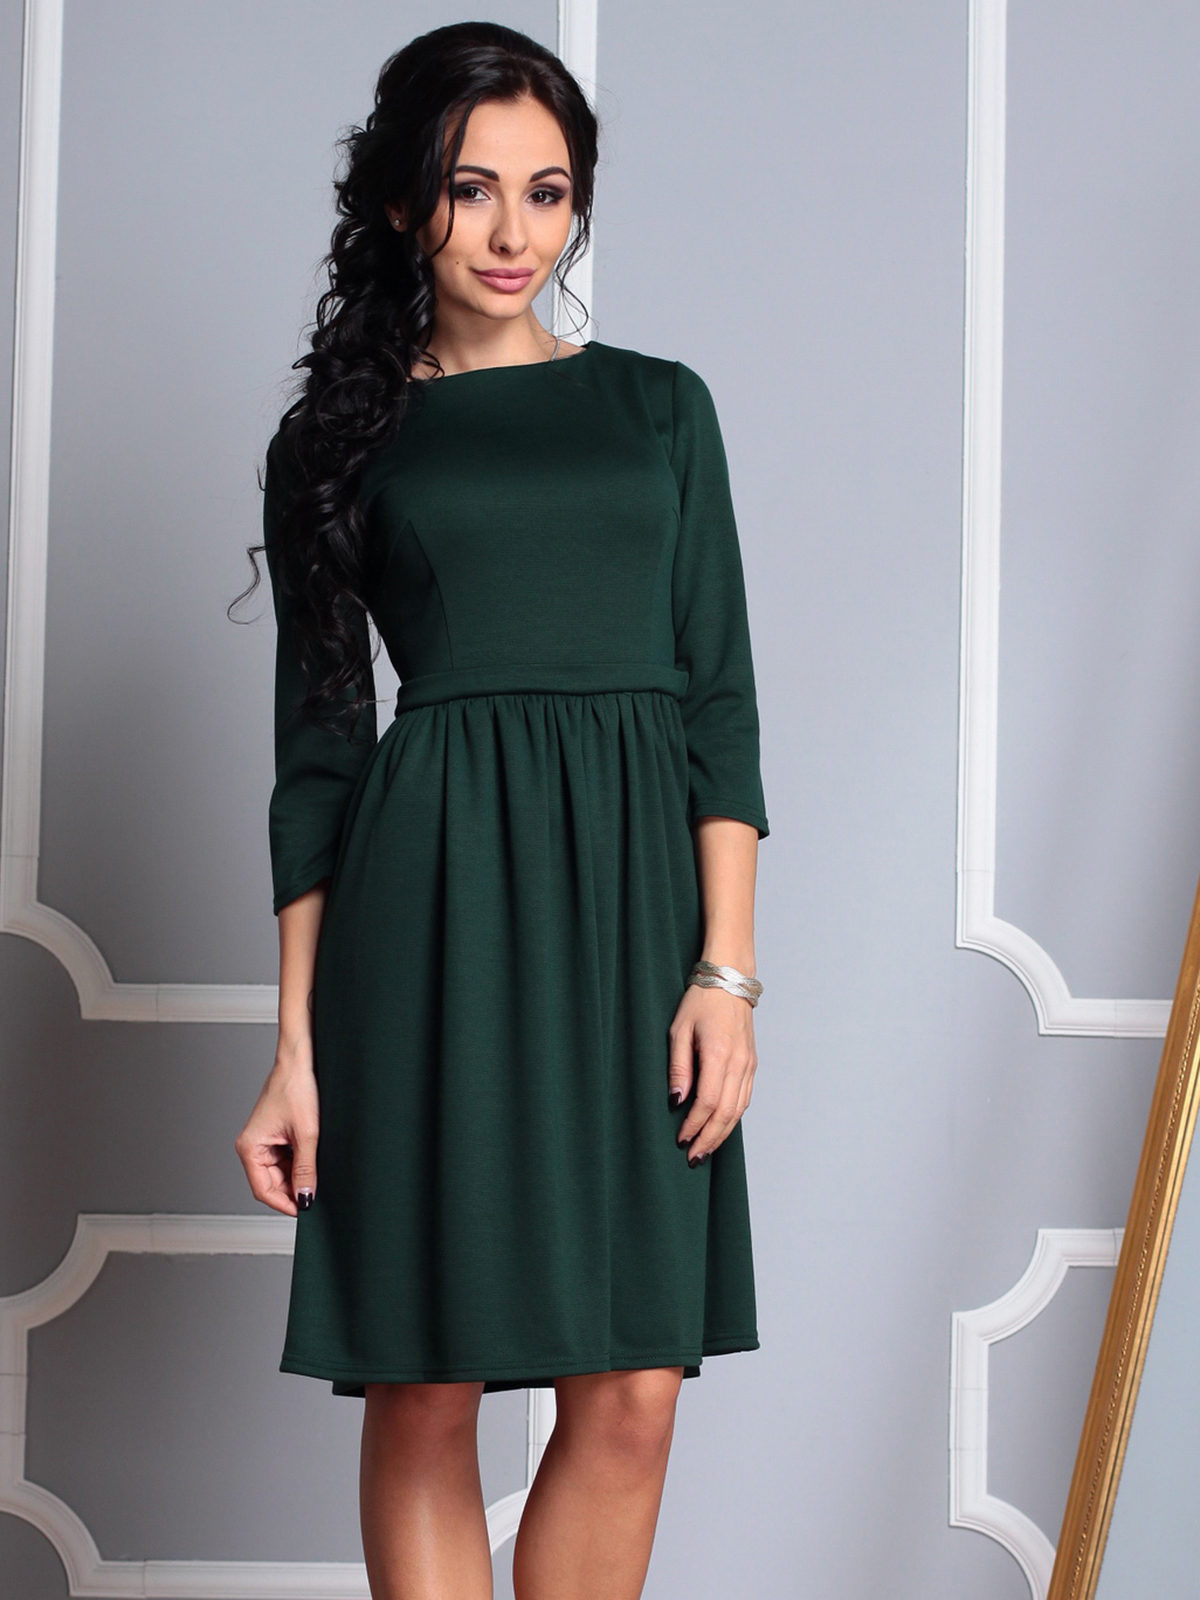 Красивое платье до колена картинки